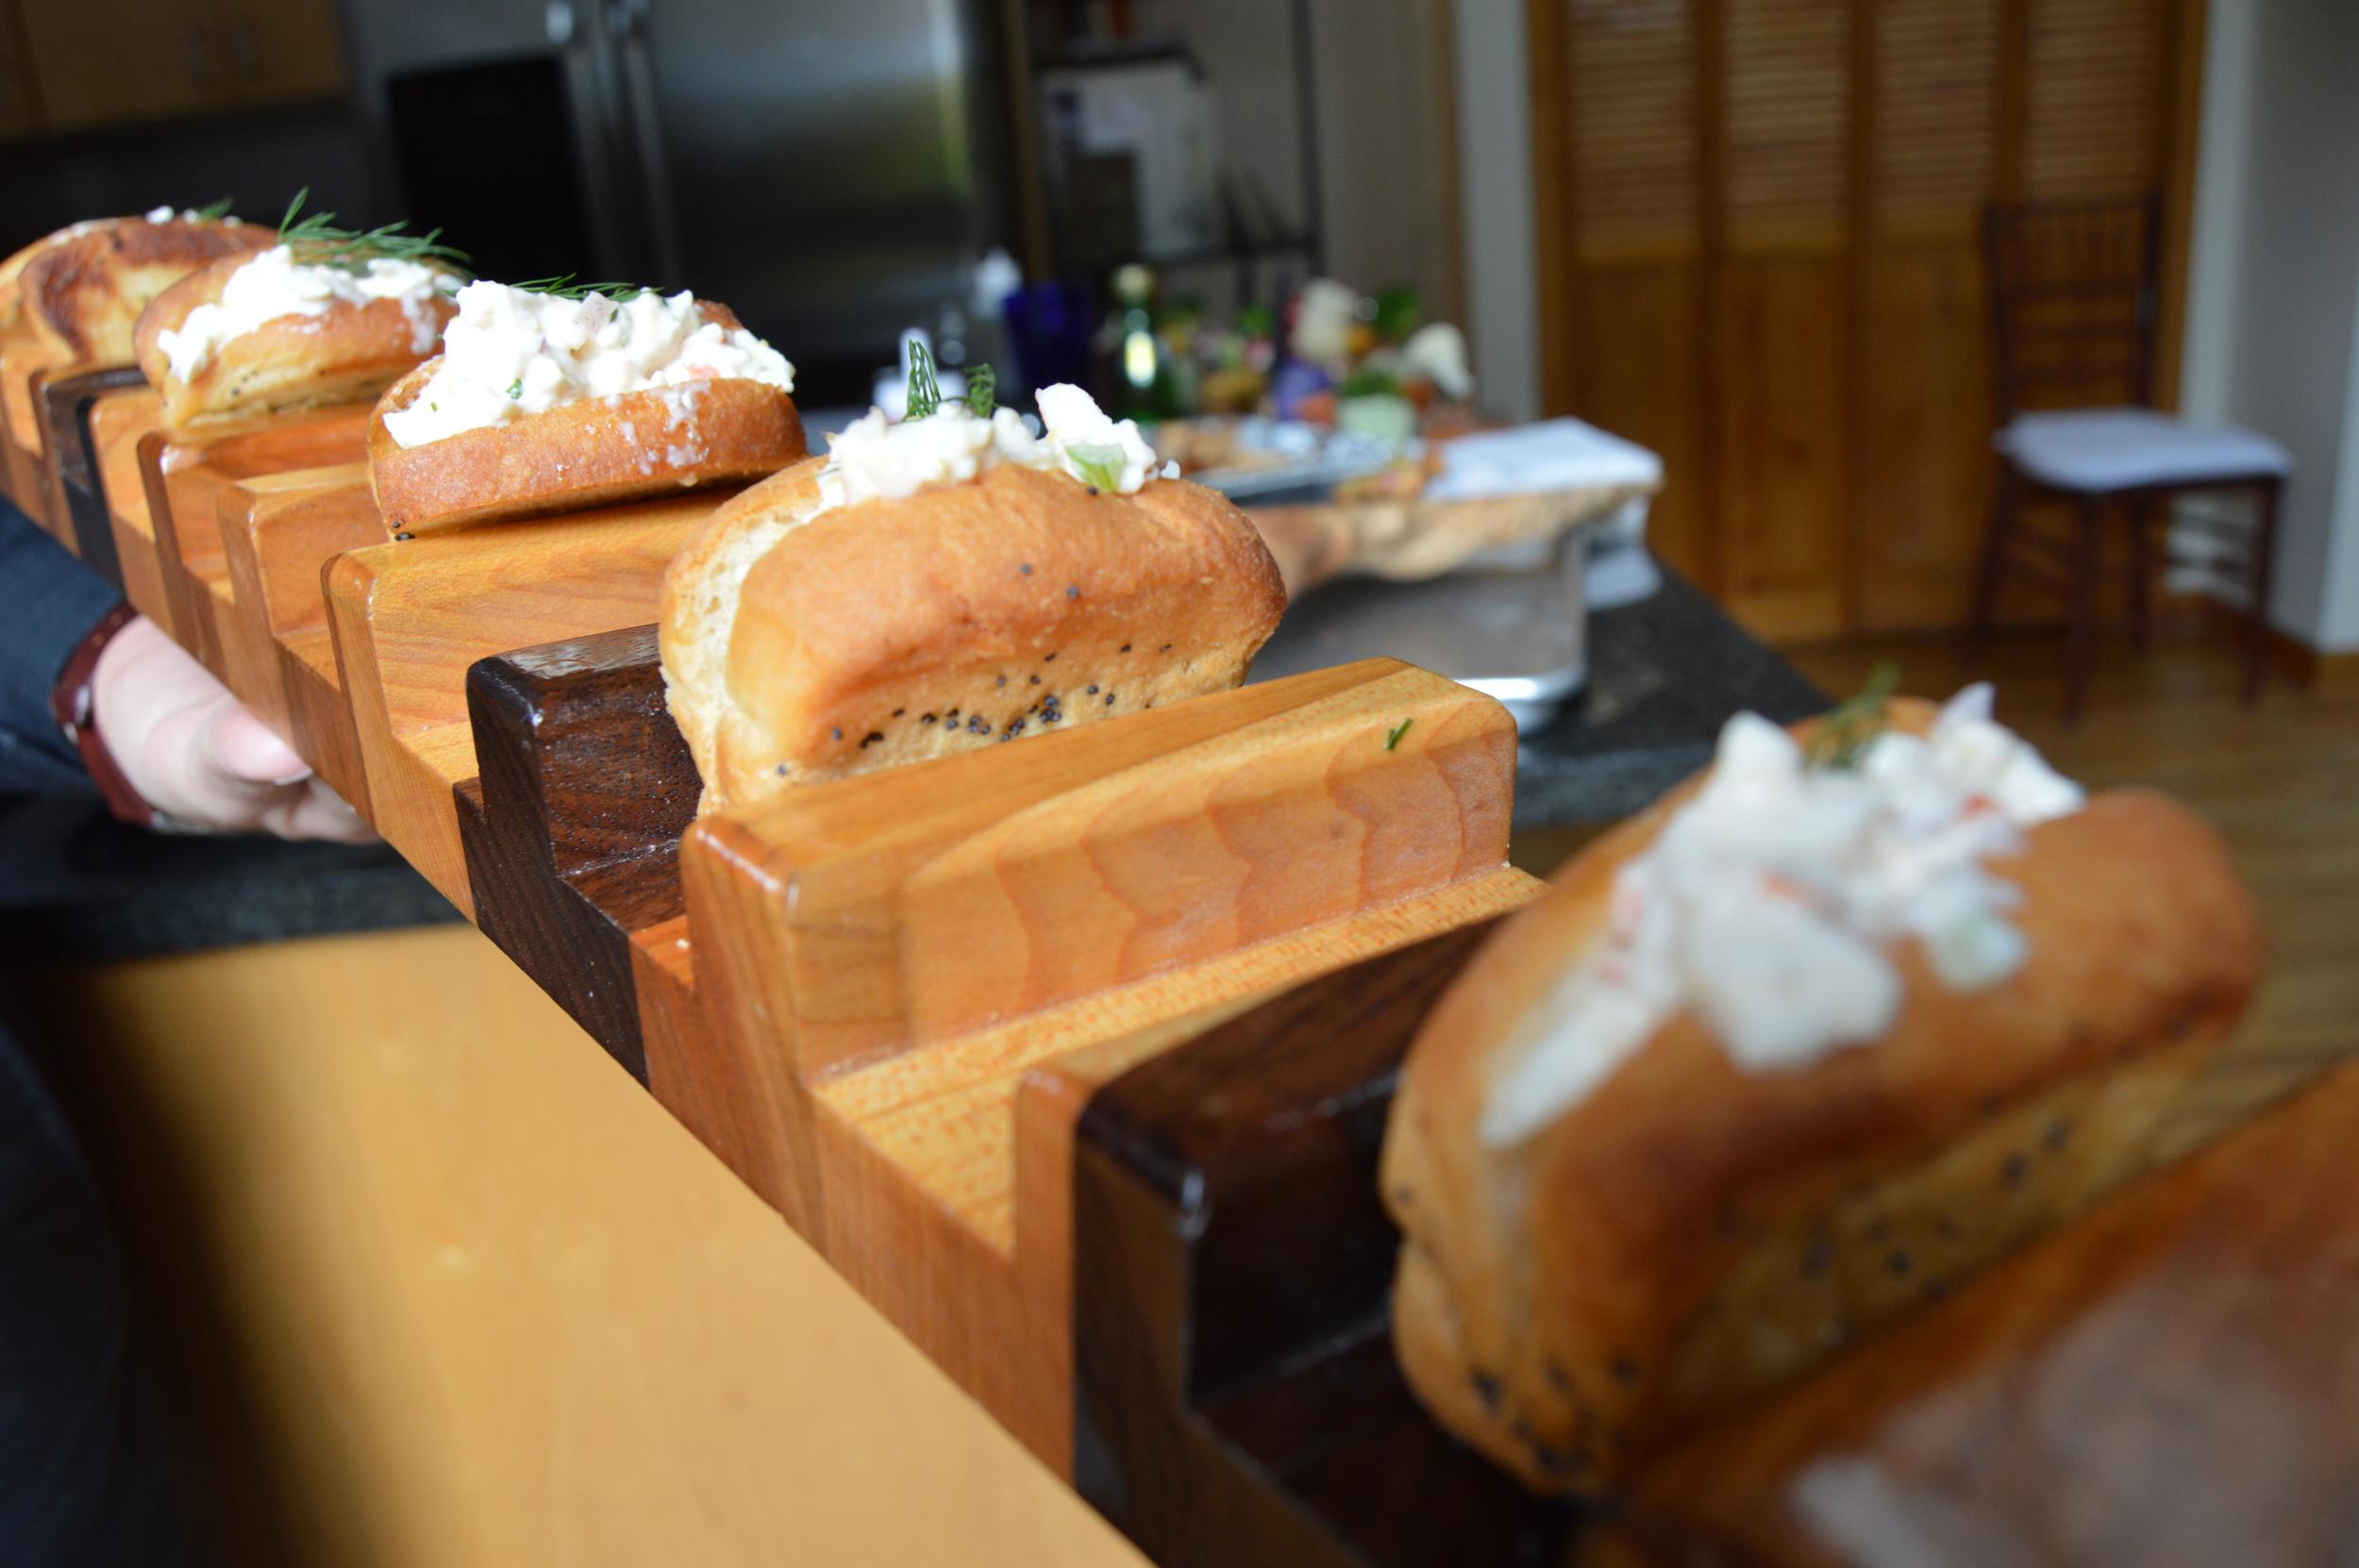 Miniature lobster rolls, served on a platterdesigned by Paul Neuman